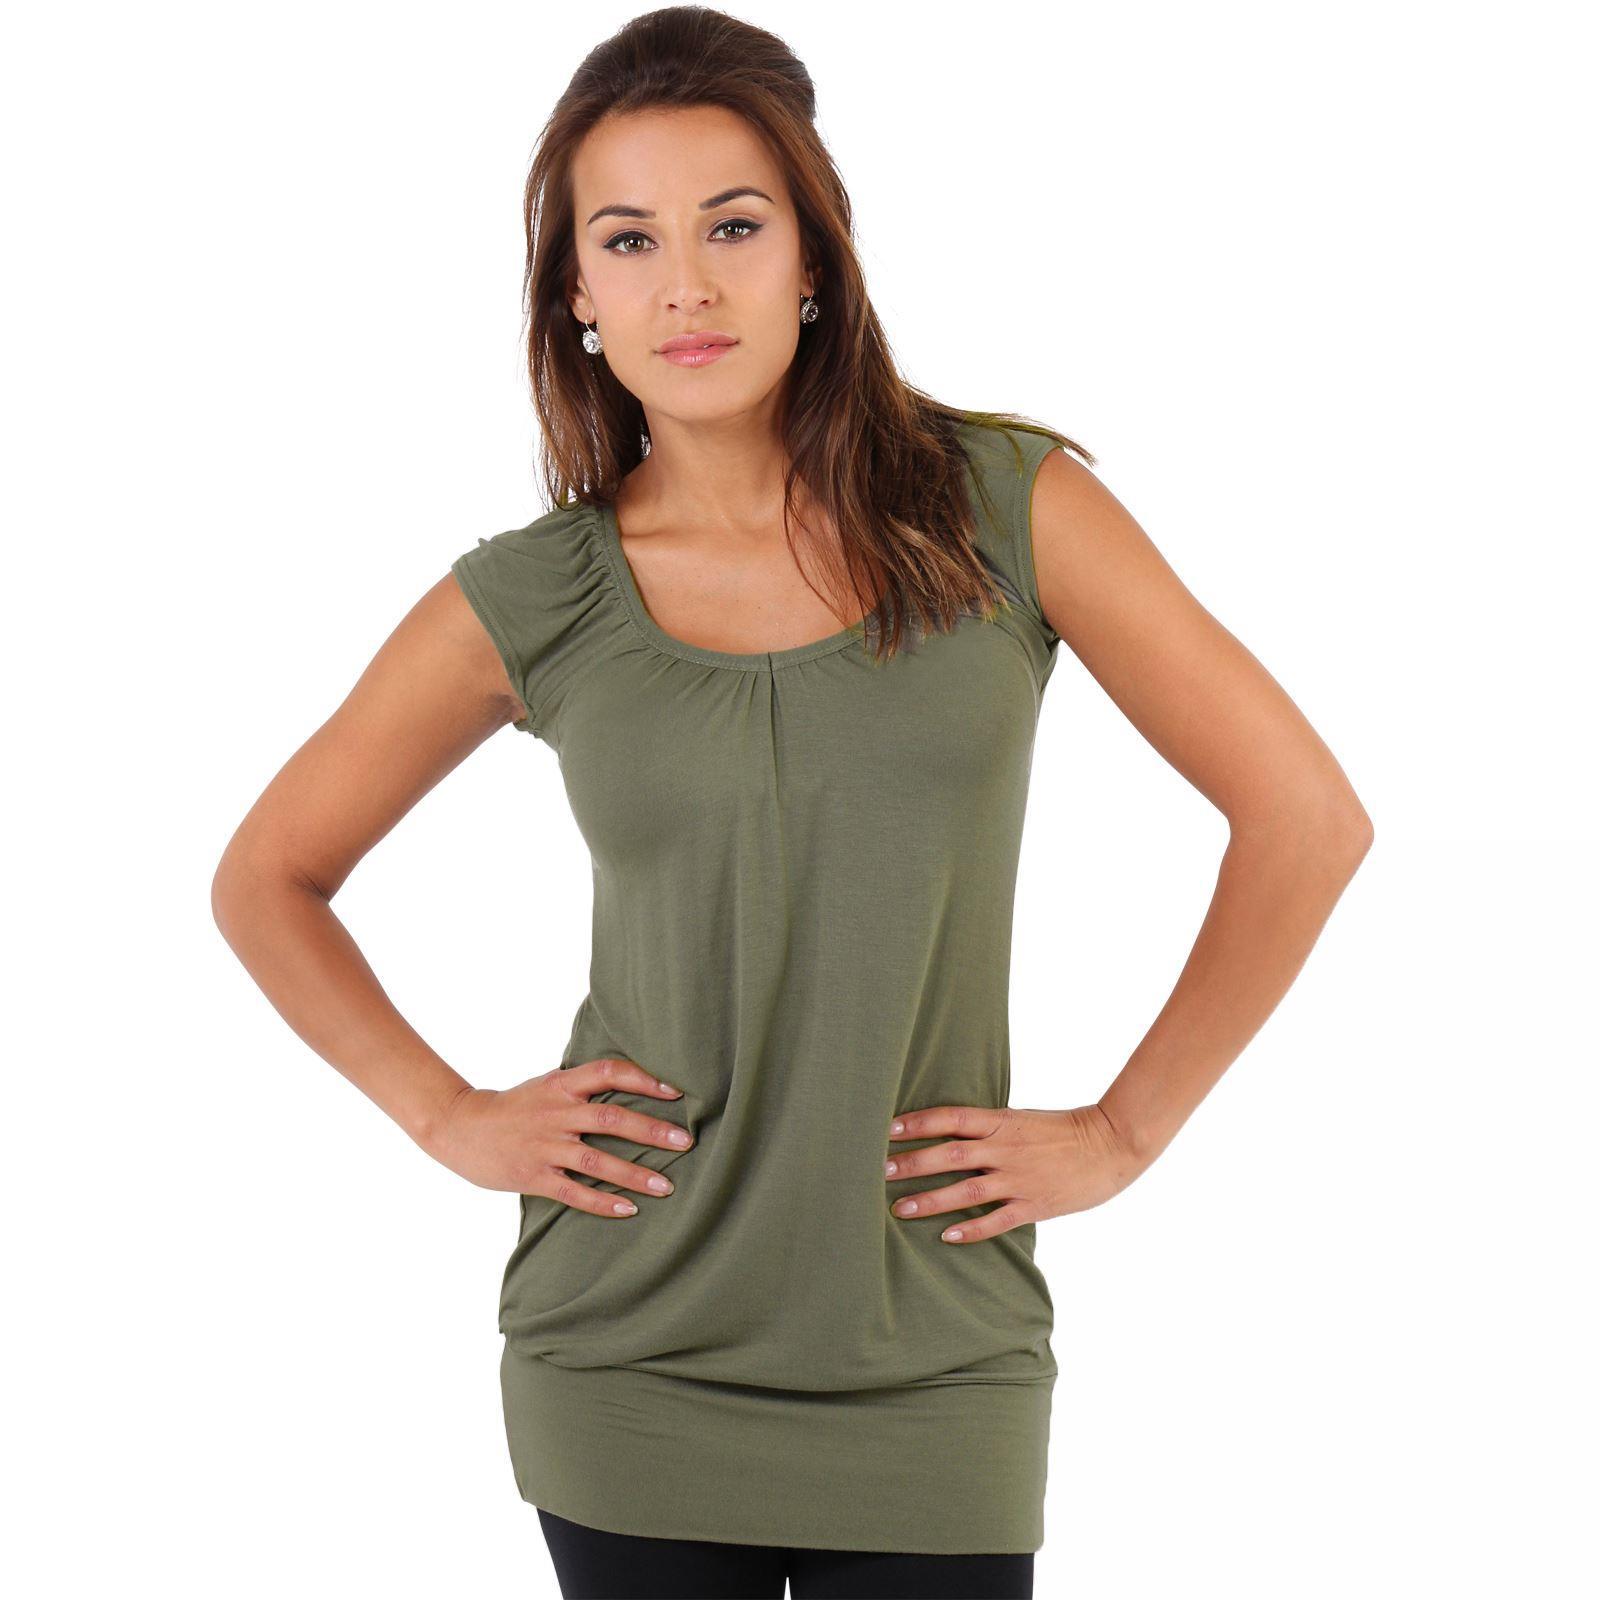 Womens-Ladies-Plain-T-Shirt-Short-Sleeve-Long-Loose-V-Neck-Blouse-Tunic-Top thumbnail 25